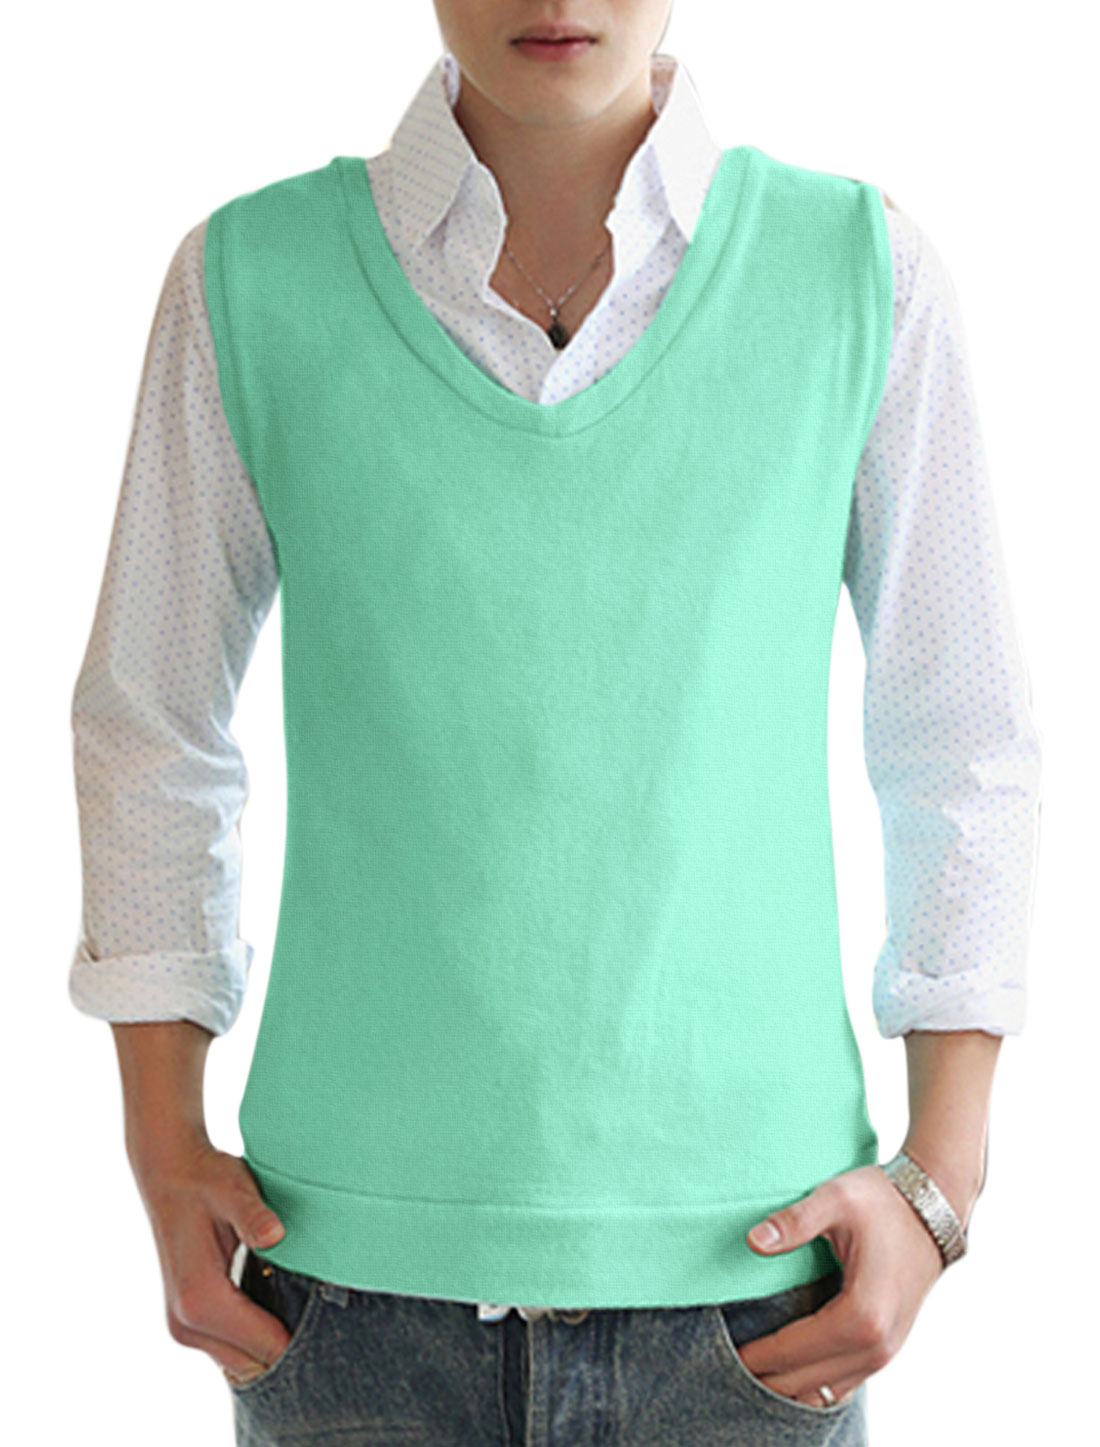 Men V Neck Sleeveless Stretchy Fashionable Cozy Fit Knit Vests Mint M